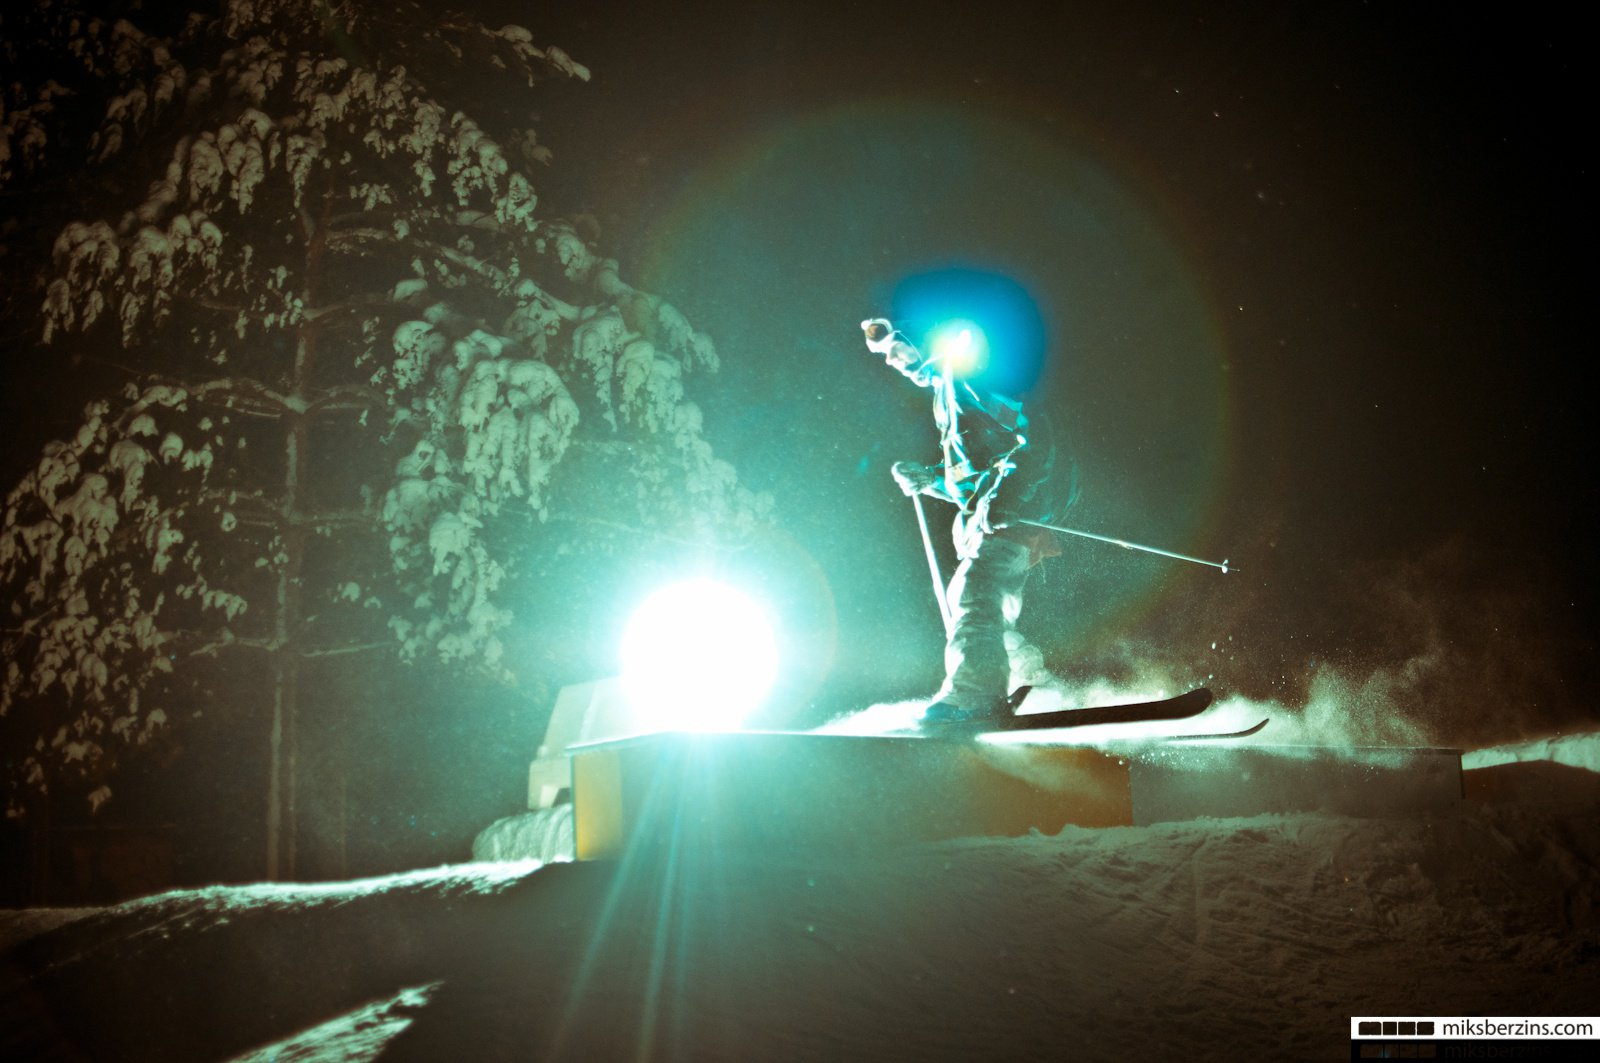 Cosmos skiing